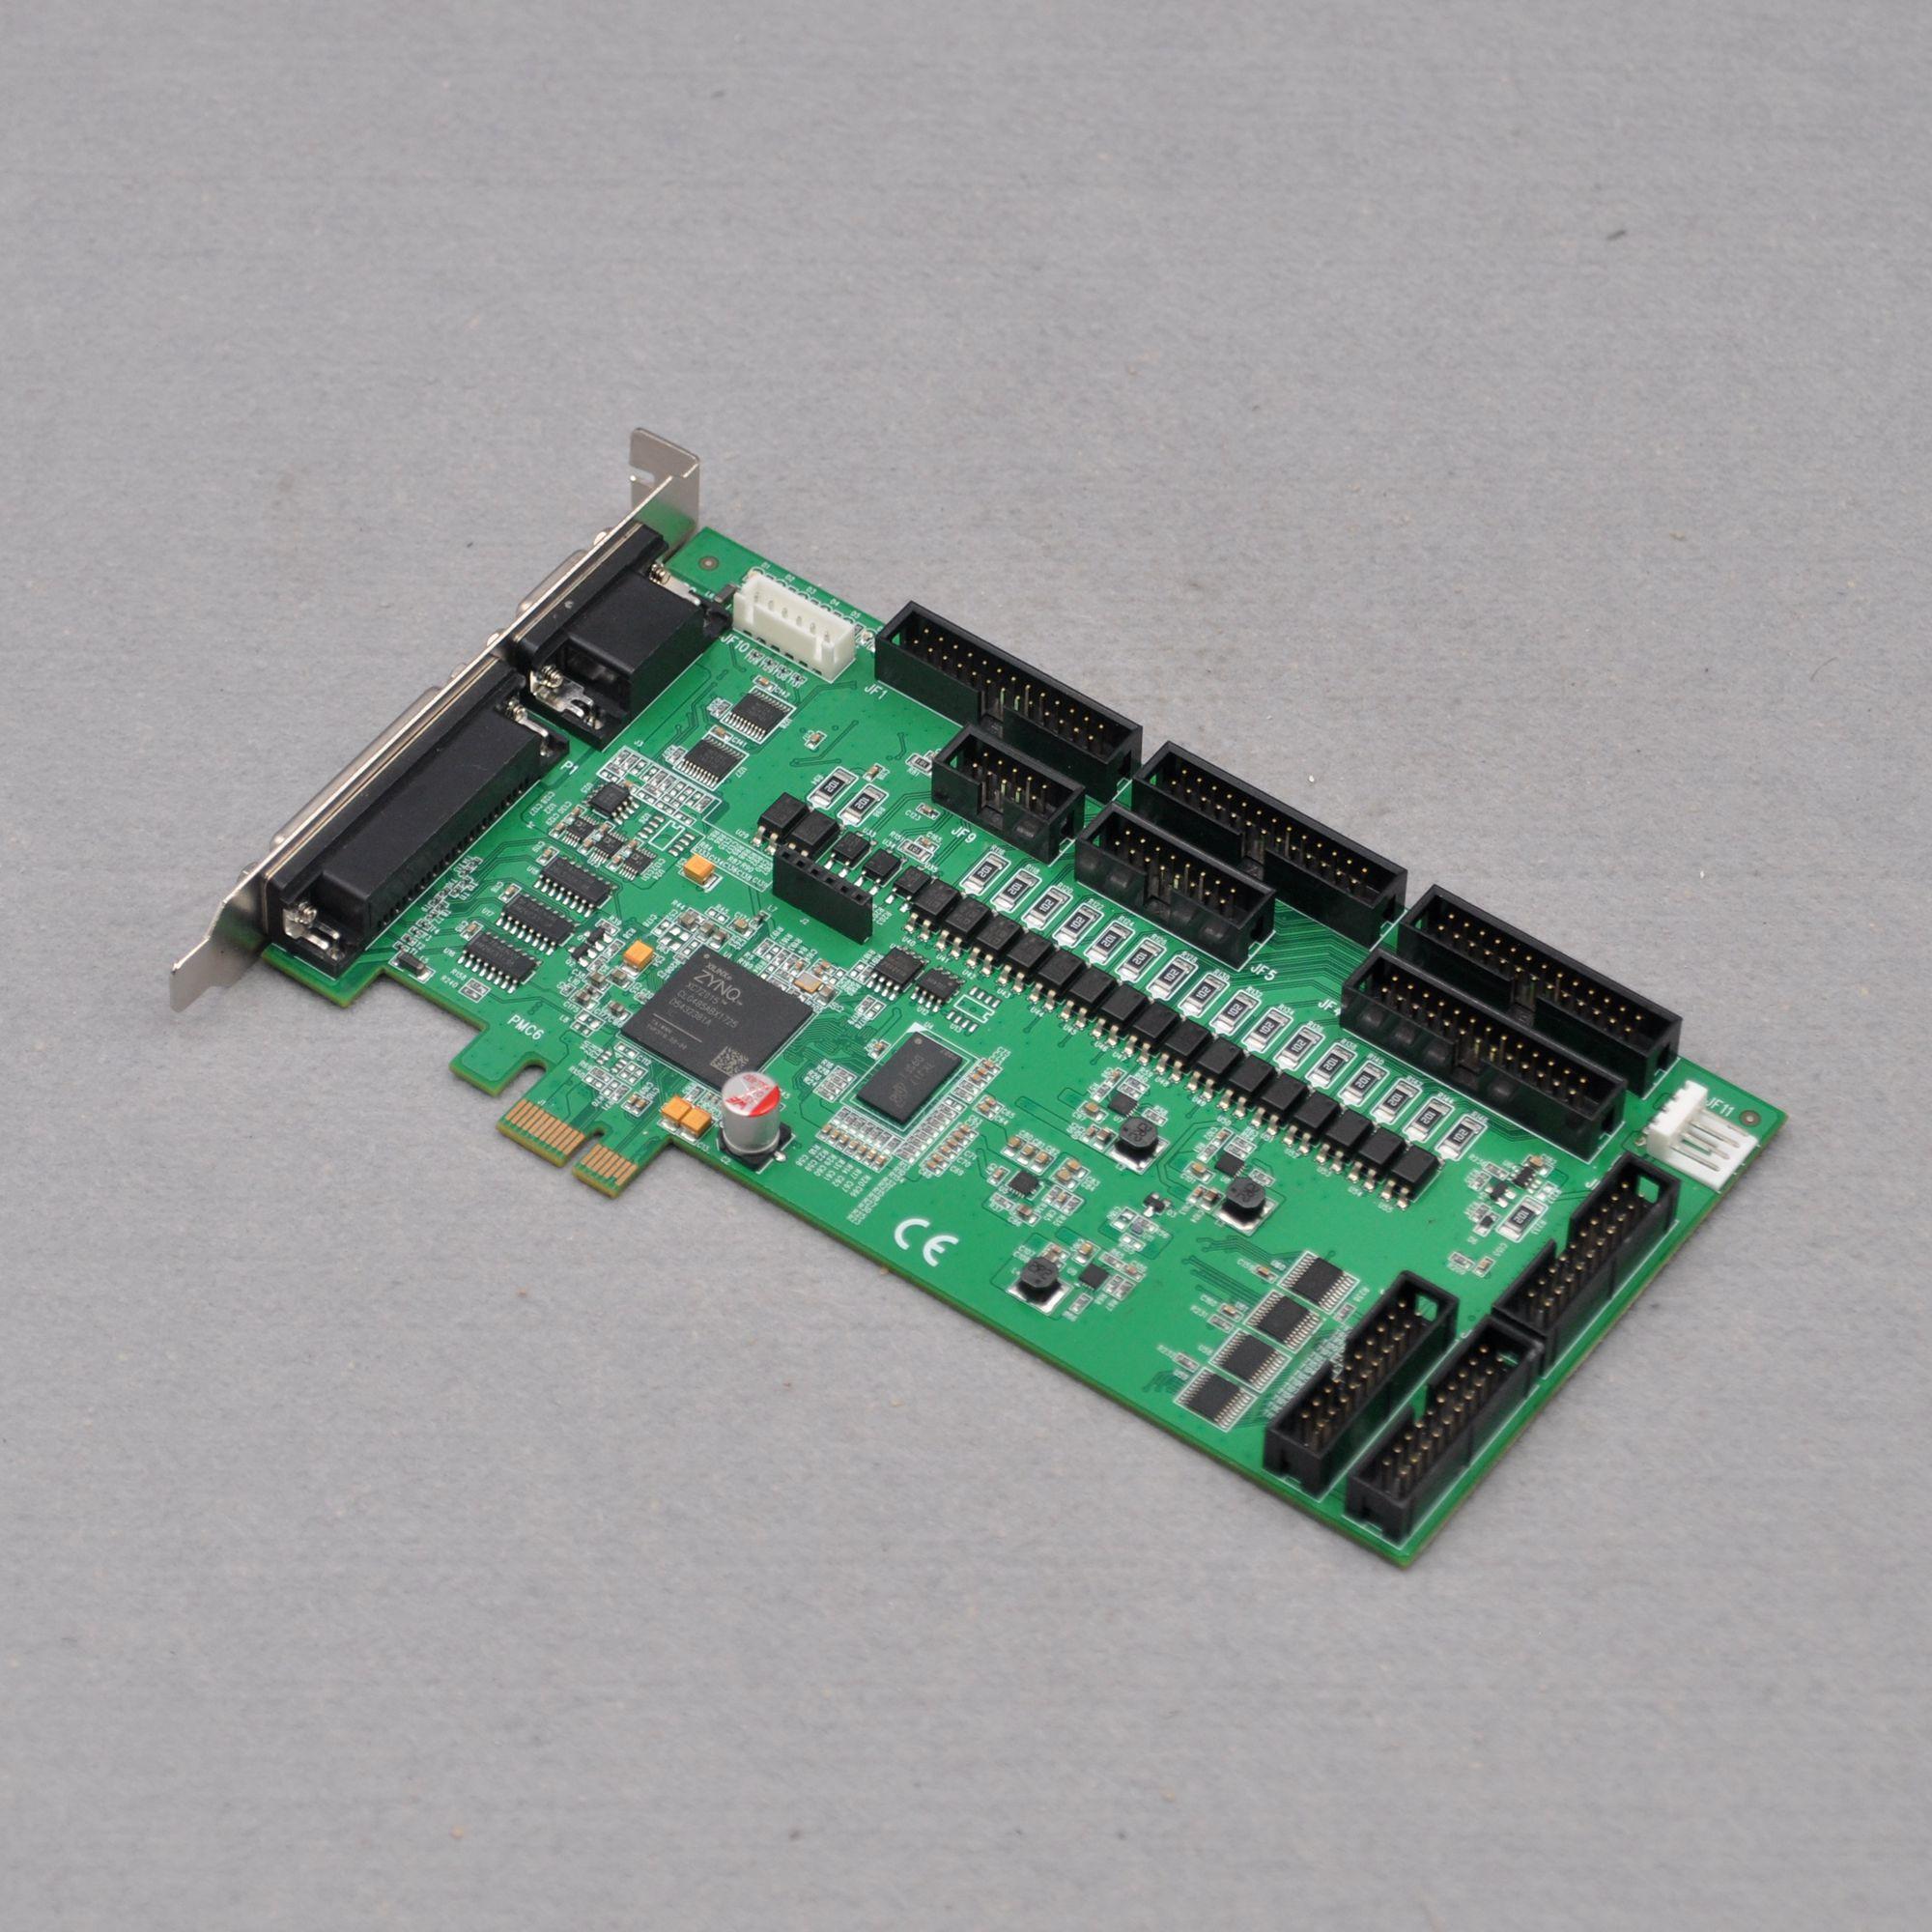 Taiwan ML-194V-0 E339220 Vision Card Data Acquisition Card